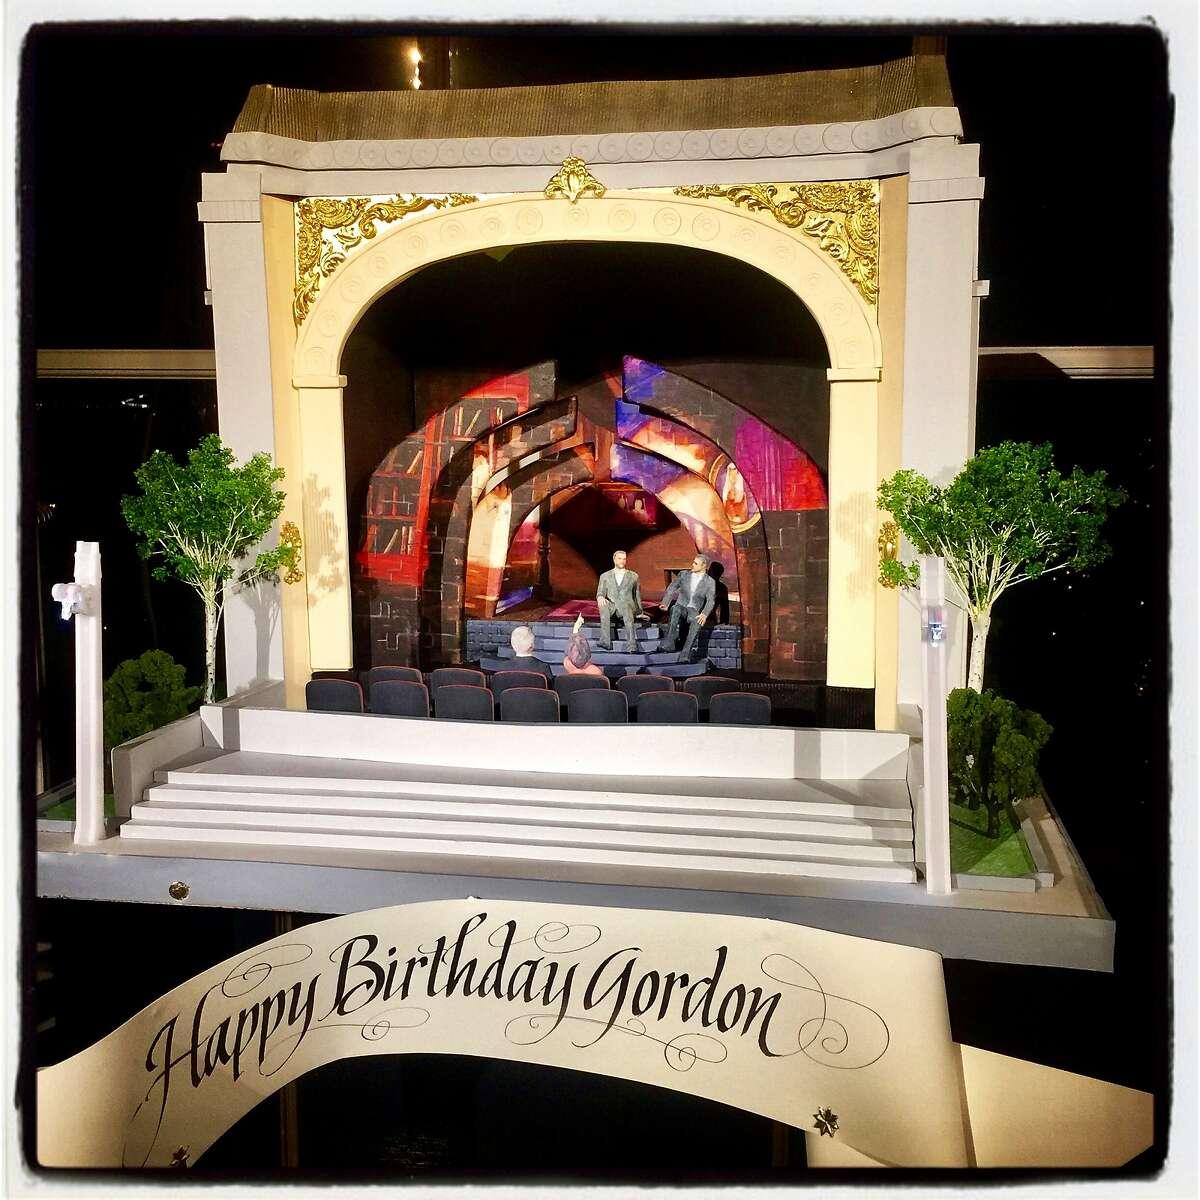 Sam Godfrey's Perfect Endings' cake for Gordon Getty's 84th birthday. Dec. 16, 2017.